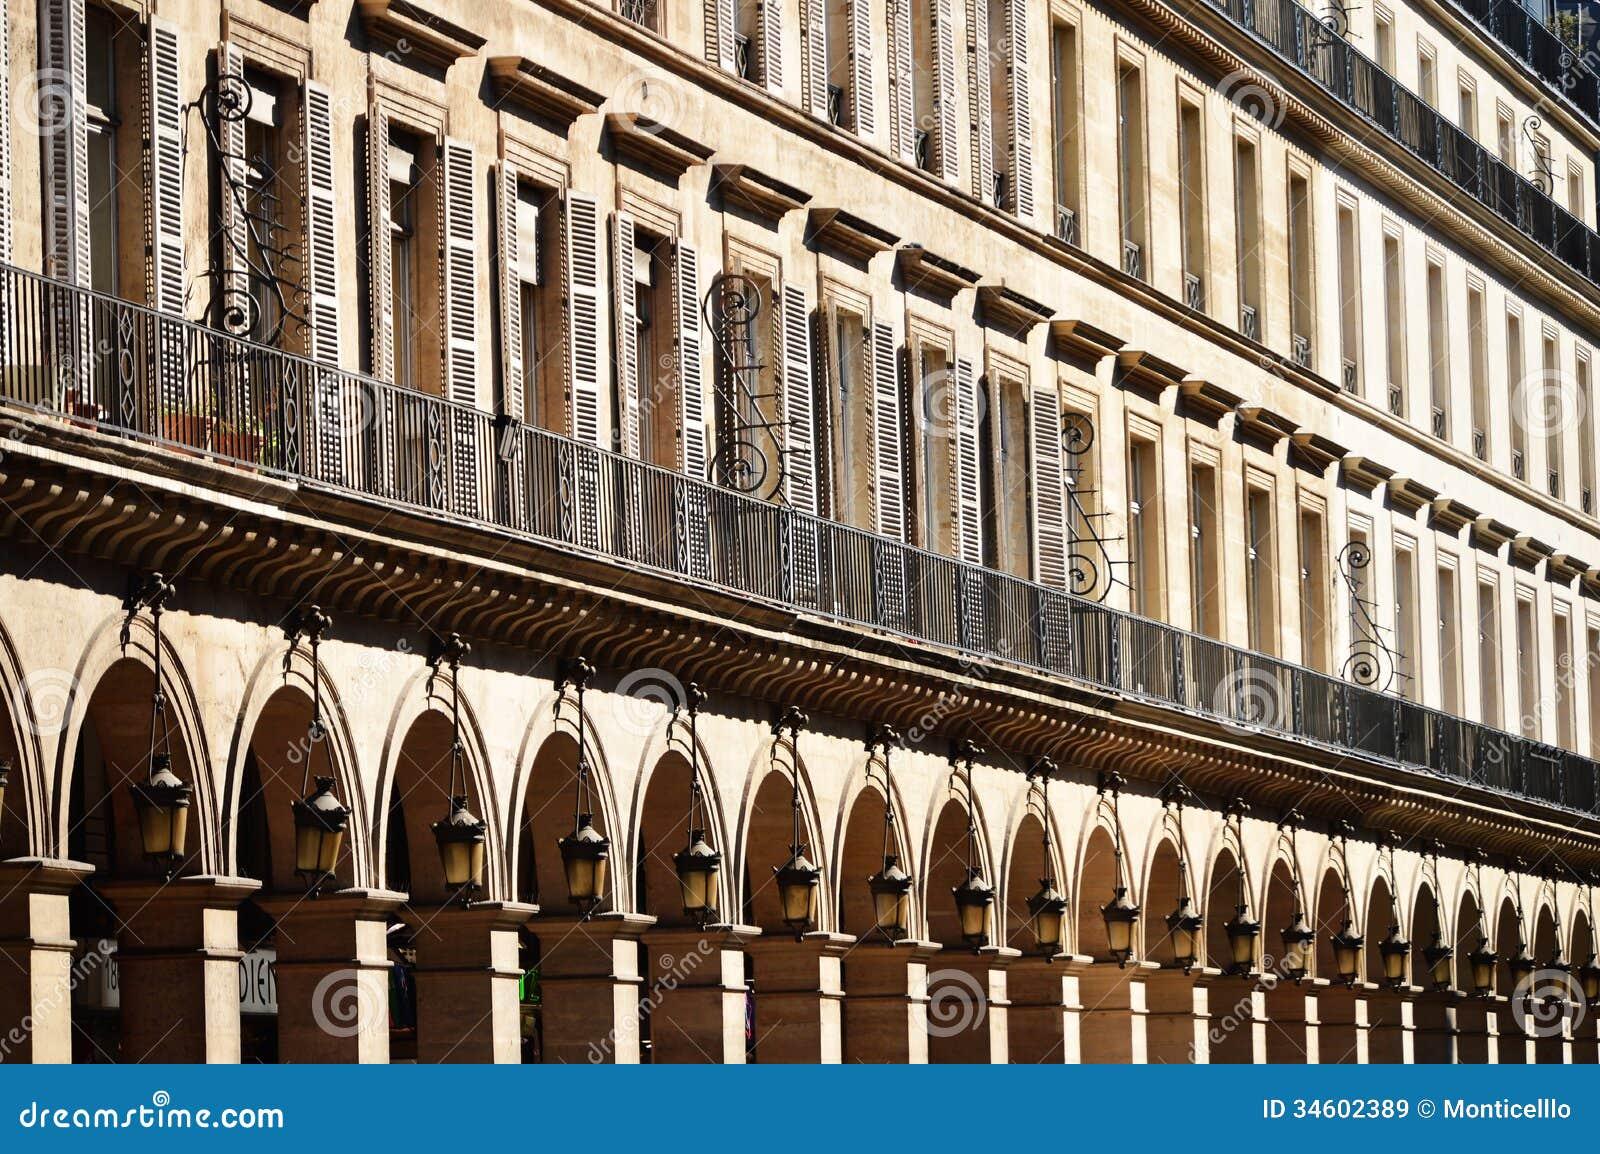 Original historic parisian architecture stock image for Architecture parisienne